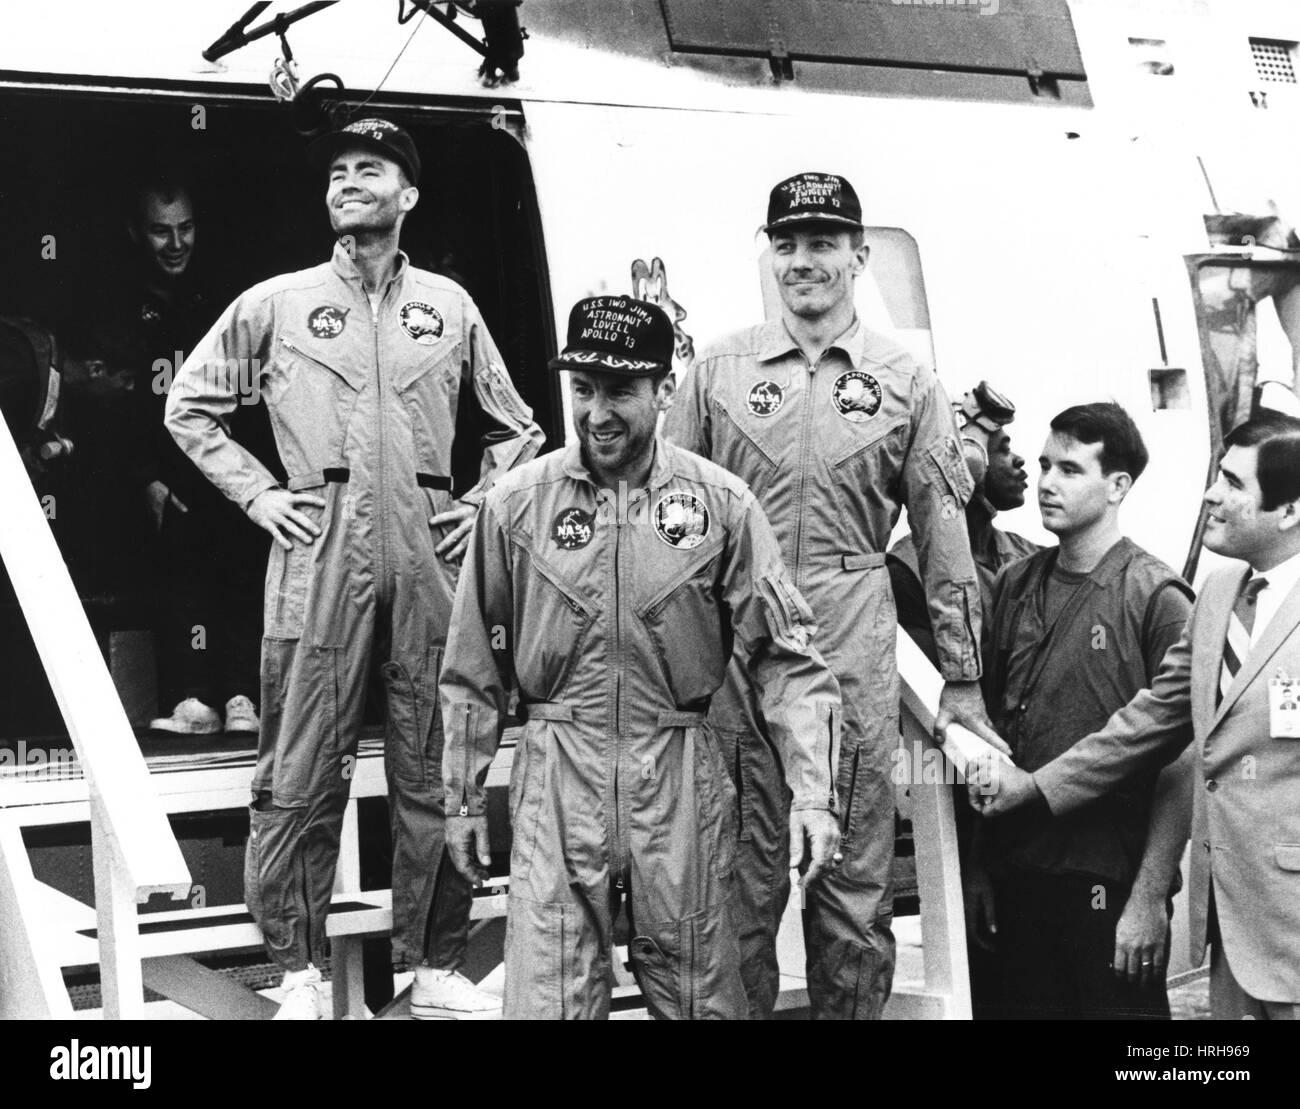 Apollo 13 Crew Returns to Earth - Stock Image